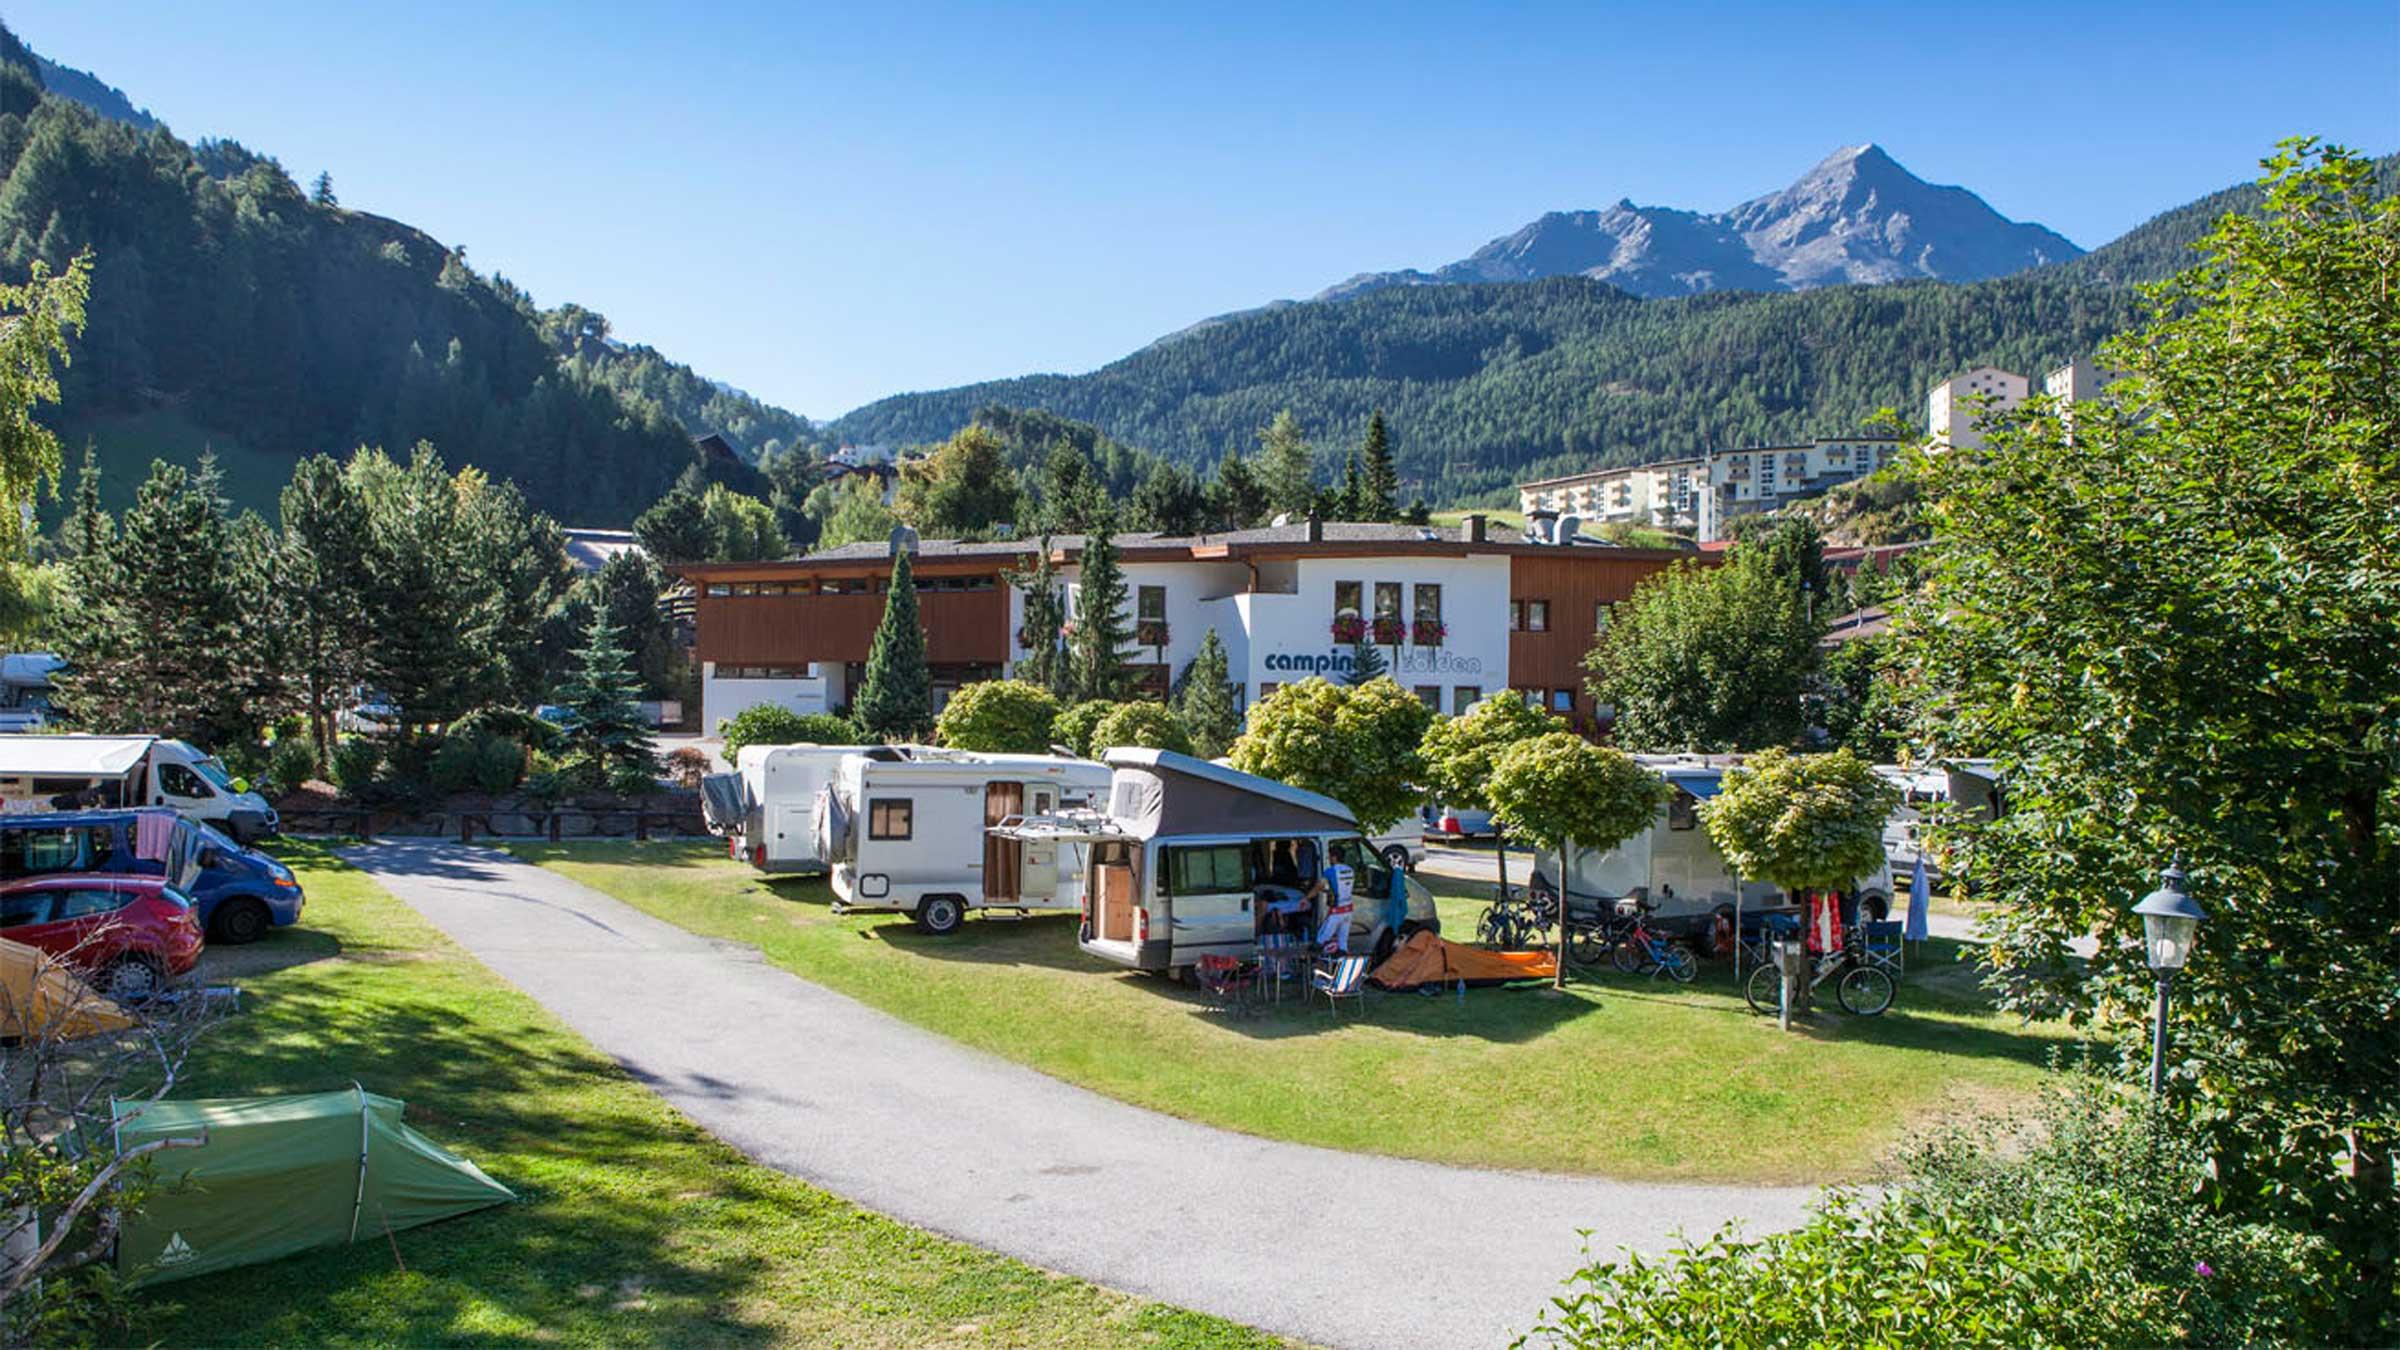 Campingplatz Sölden - Camping im Ötztal